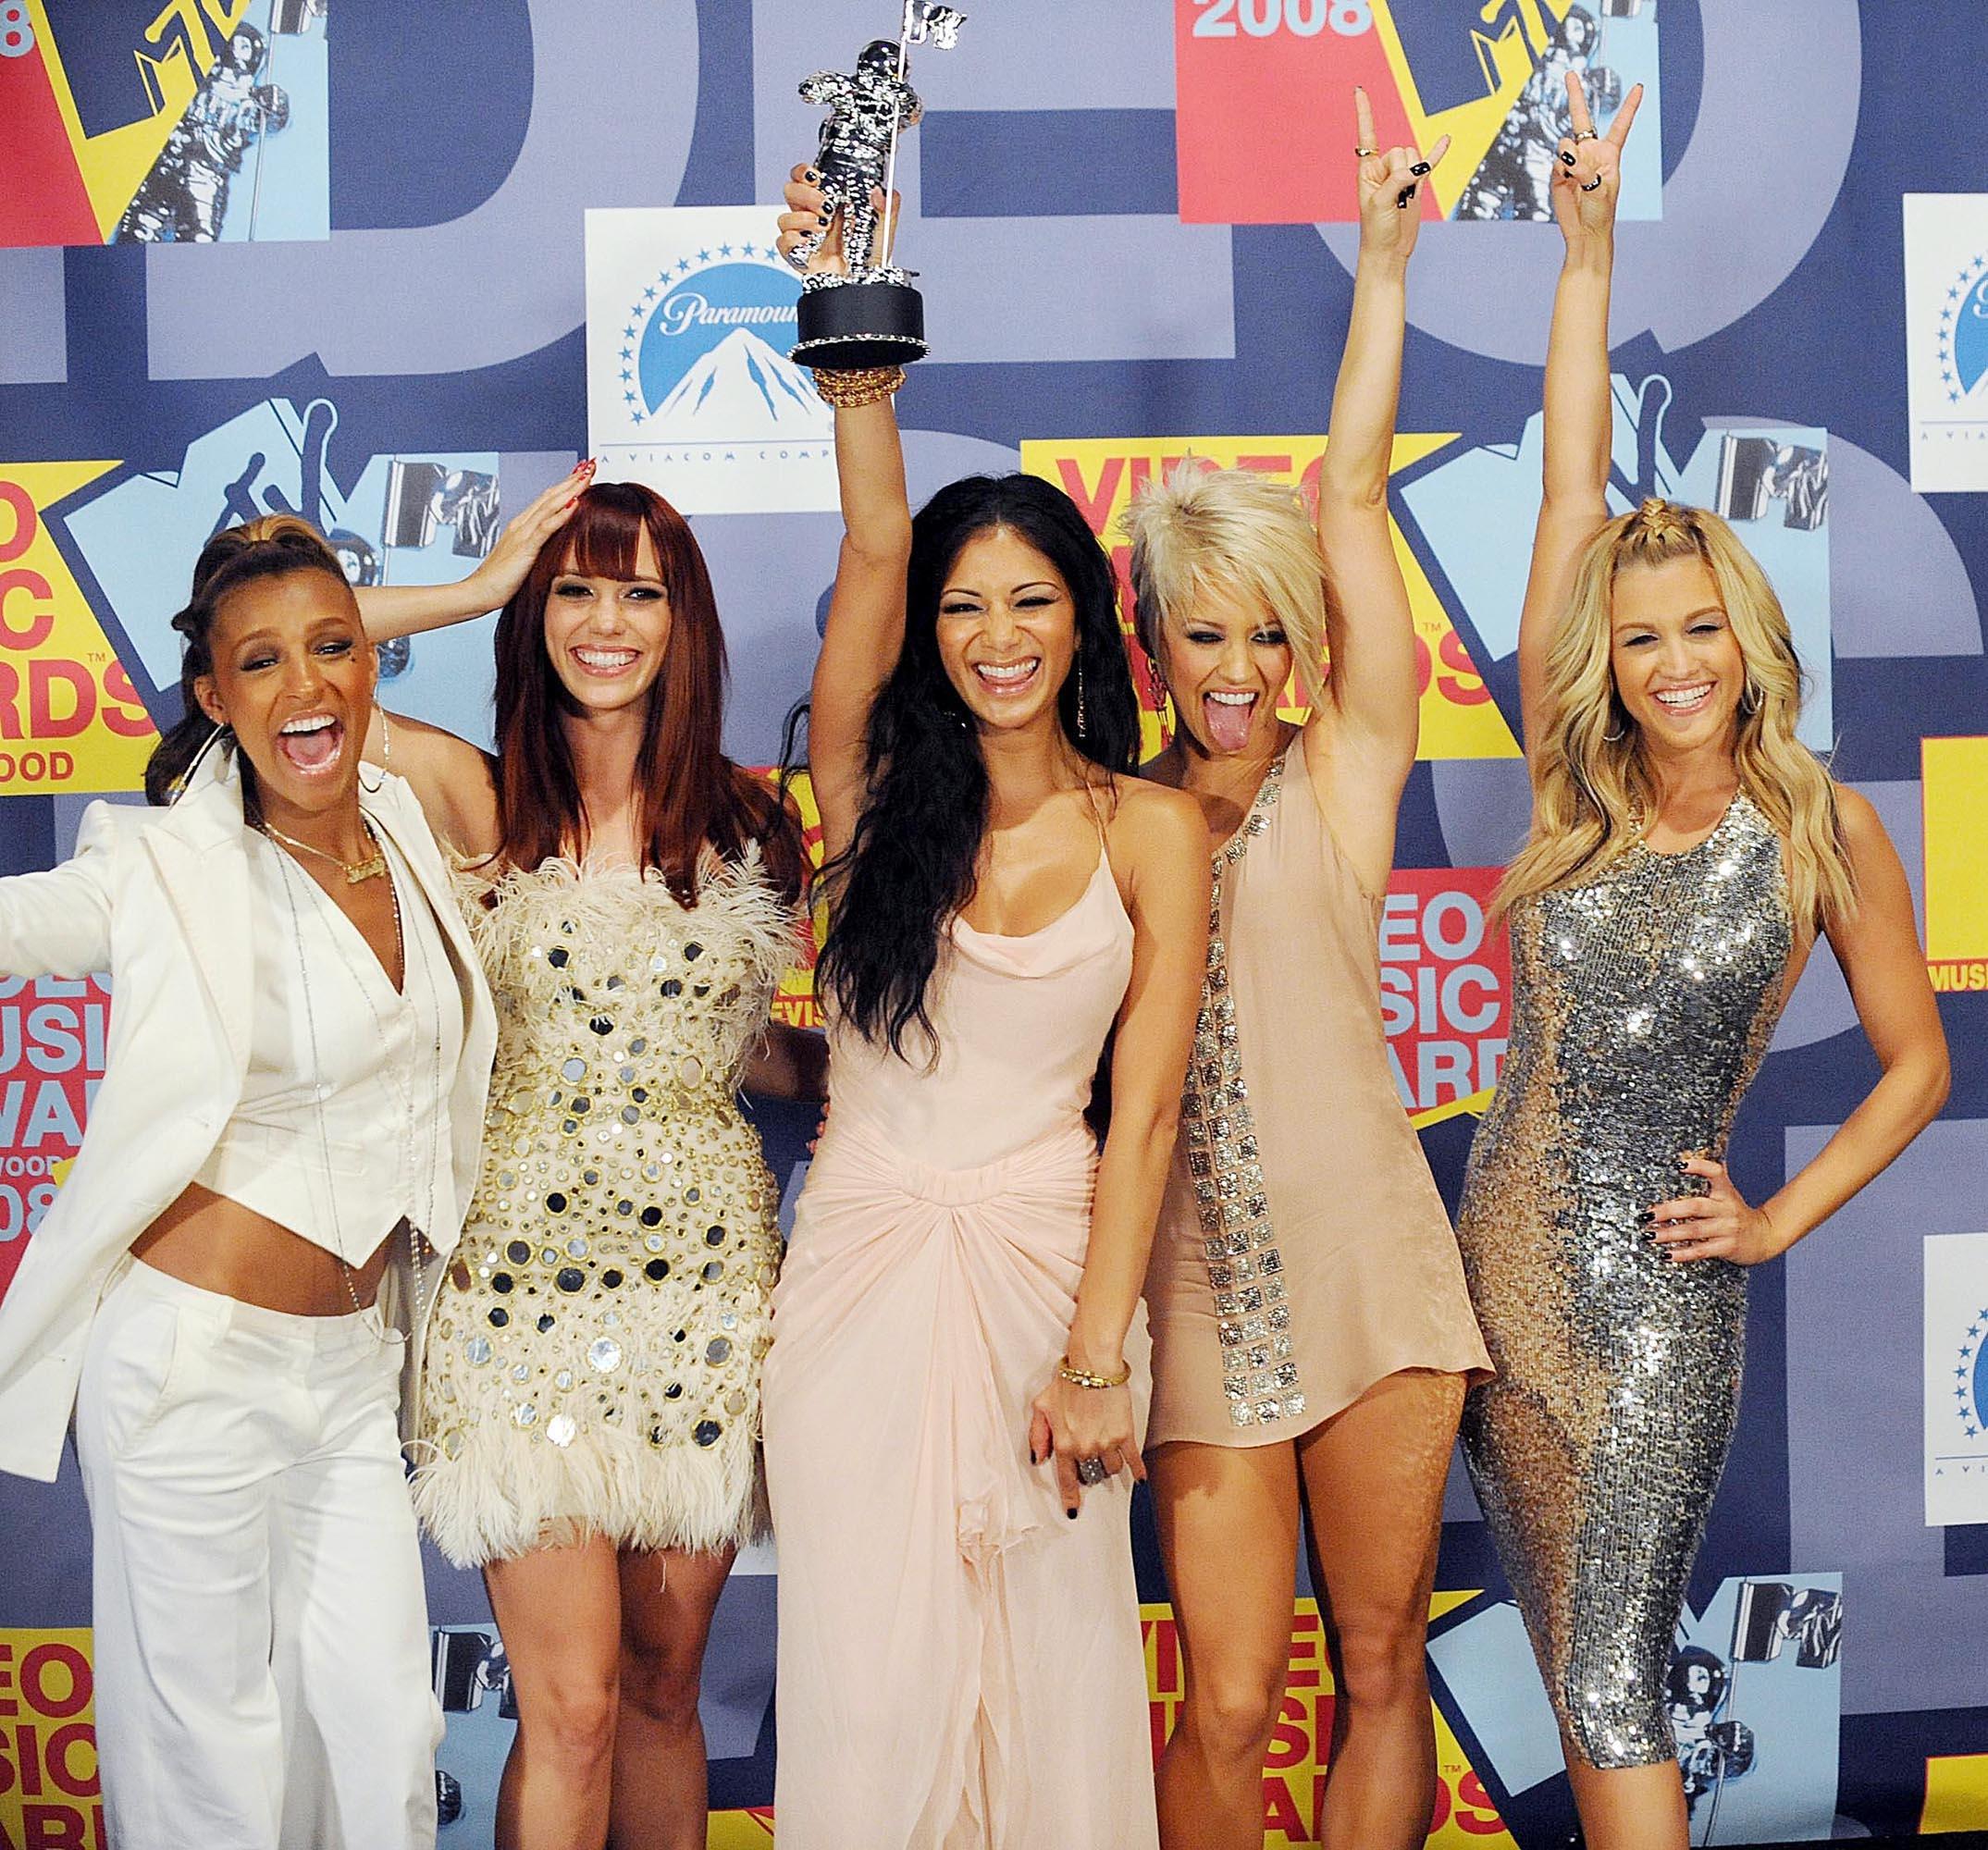 CELEBS ARRIVE FOR THE 2008 MTV MUSIC VIDEO AWARDS.